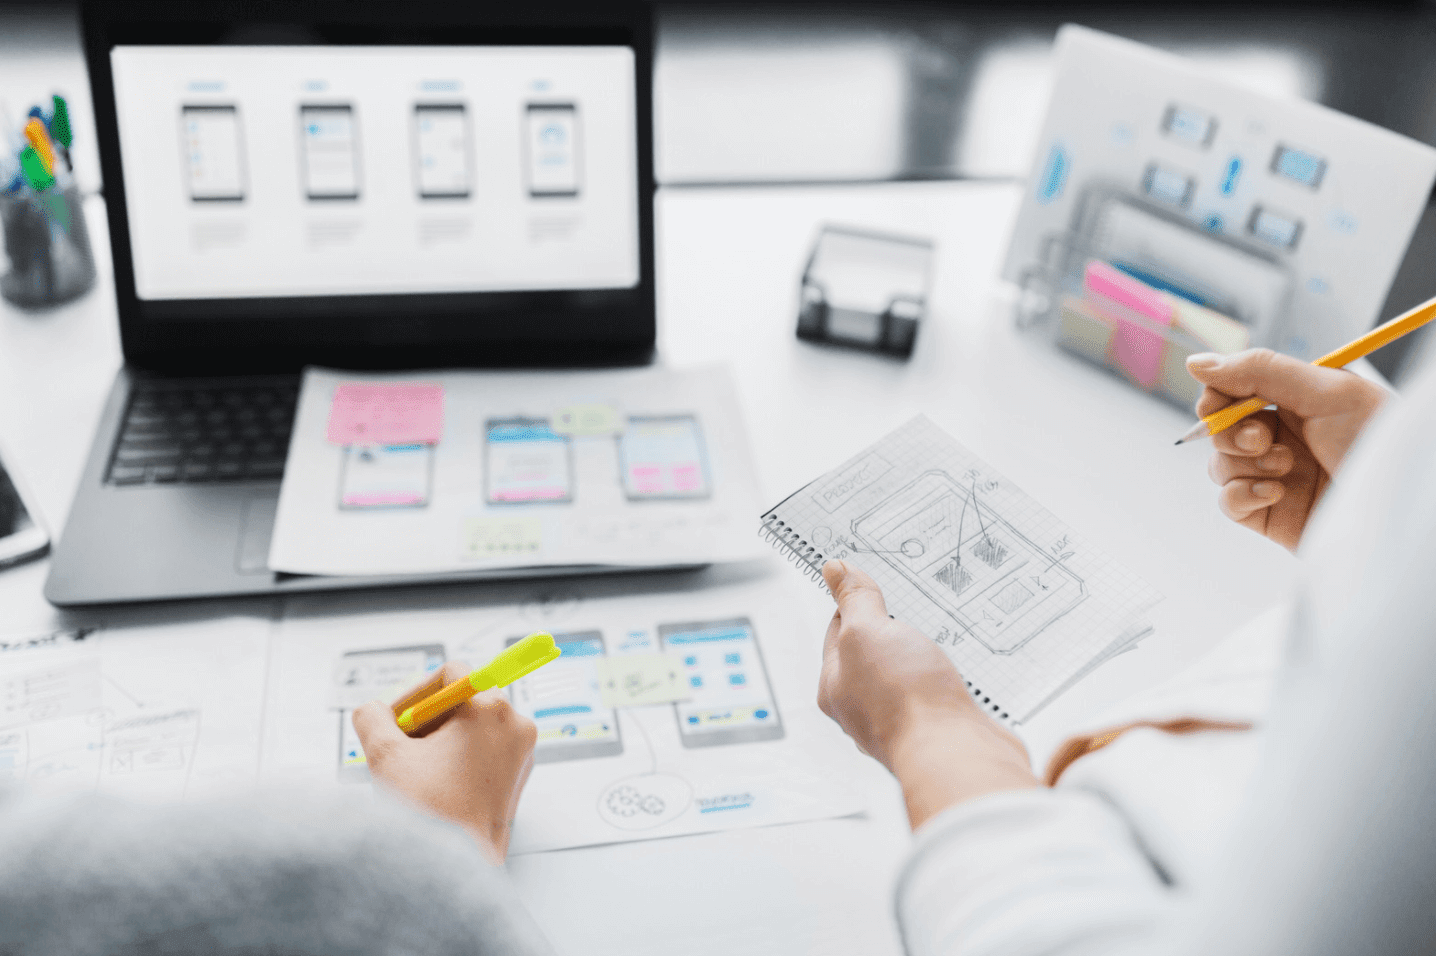 team of website designers works through the planning of regular website updates